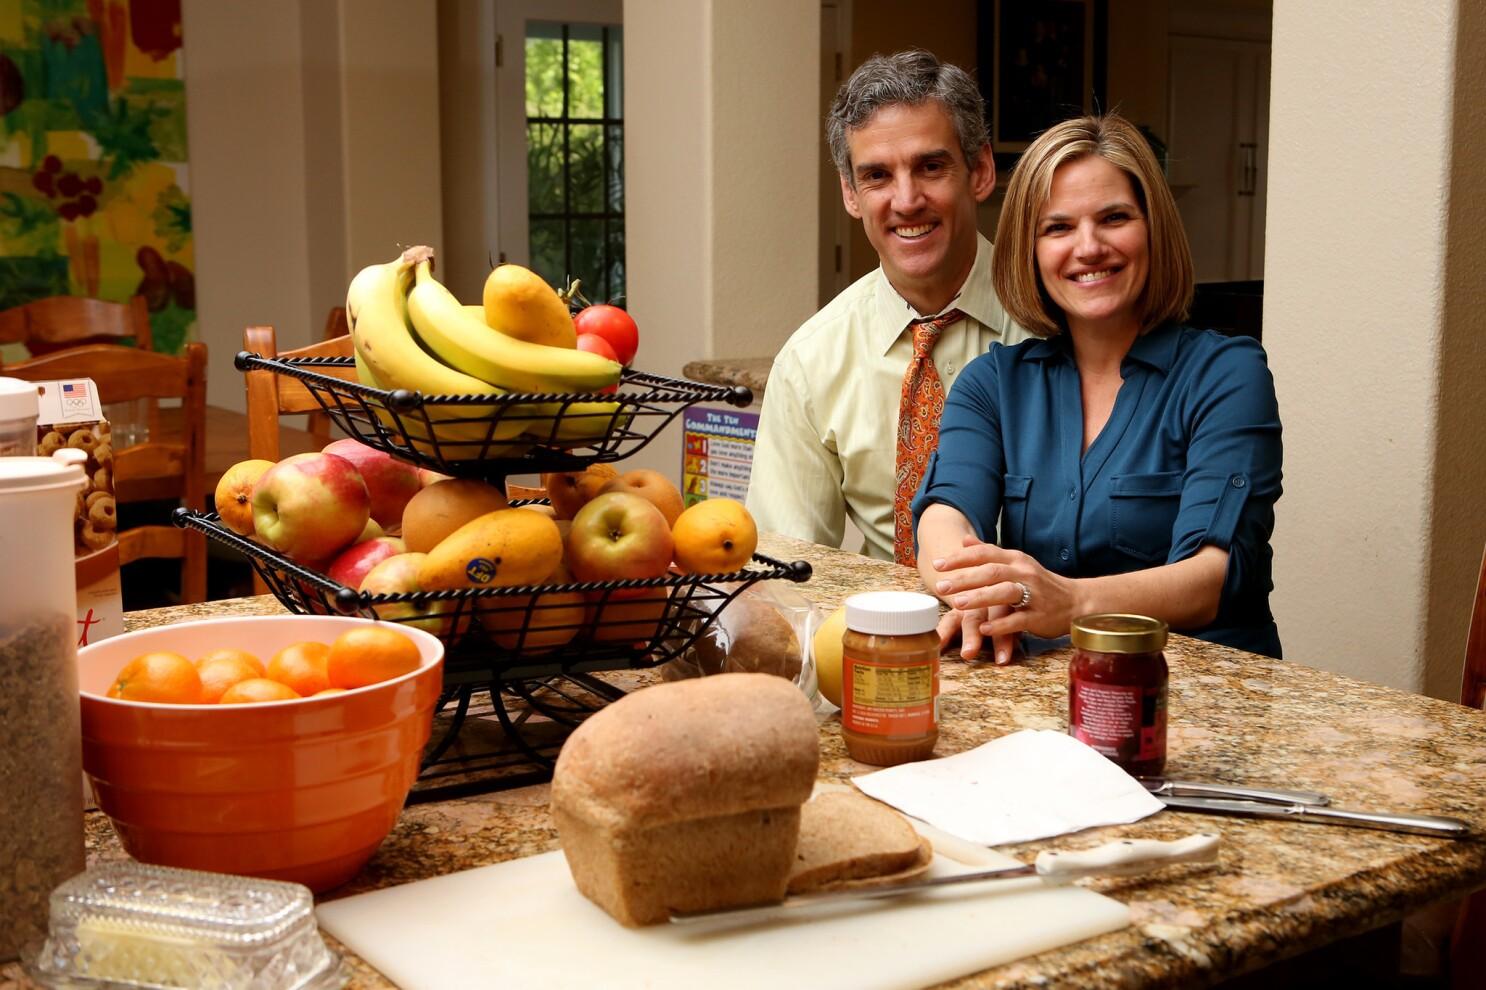 7th day adventist diet live longer